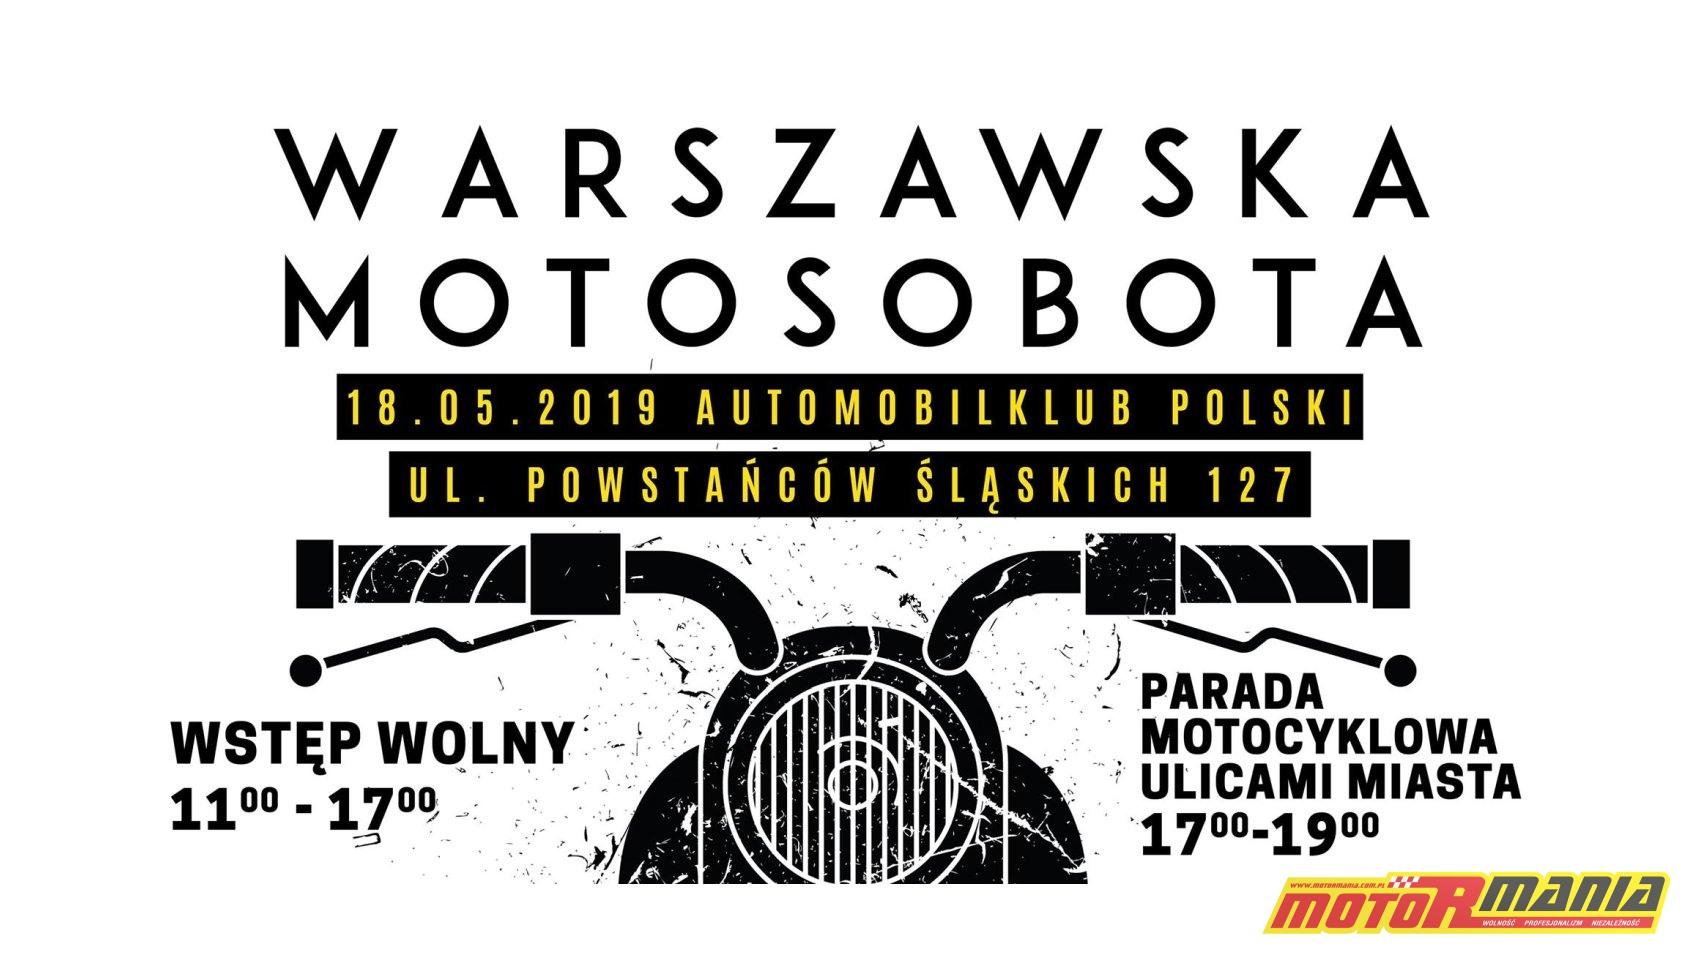 Warszawska Motosobota 2019